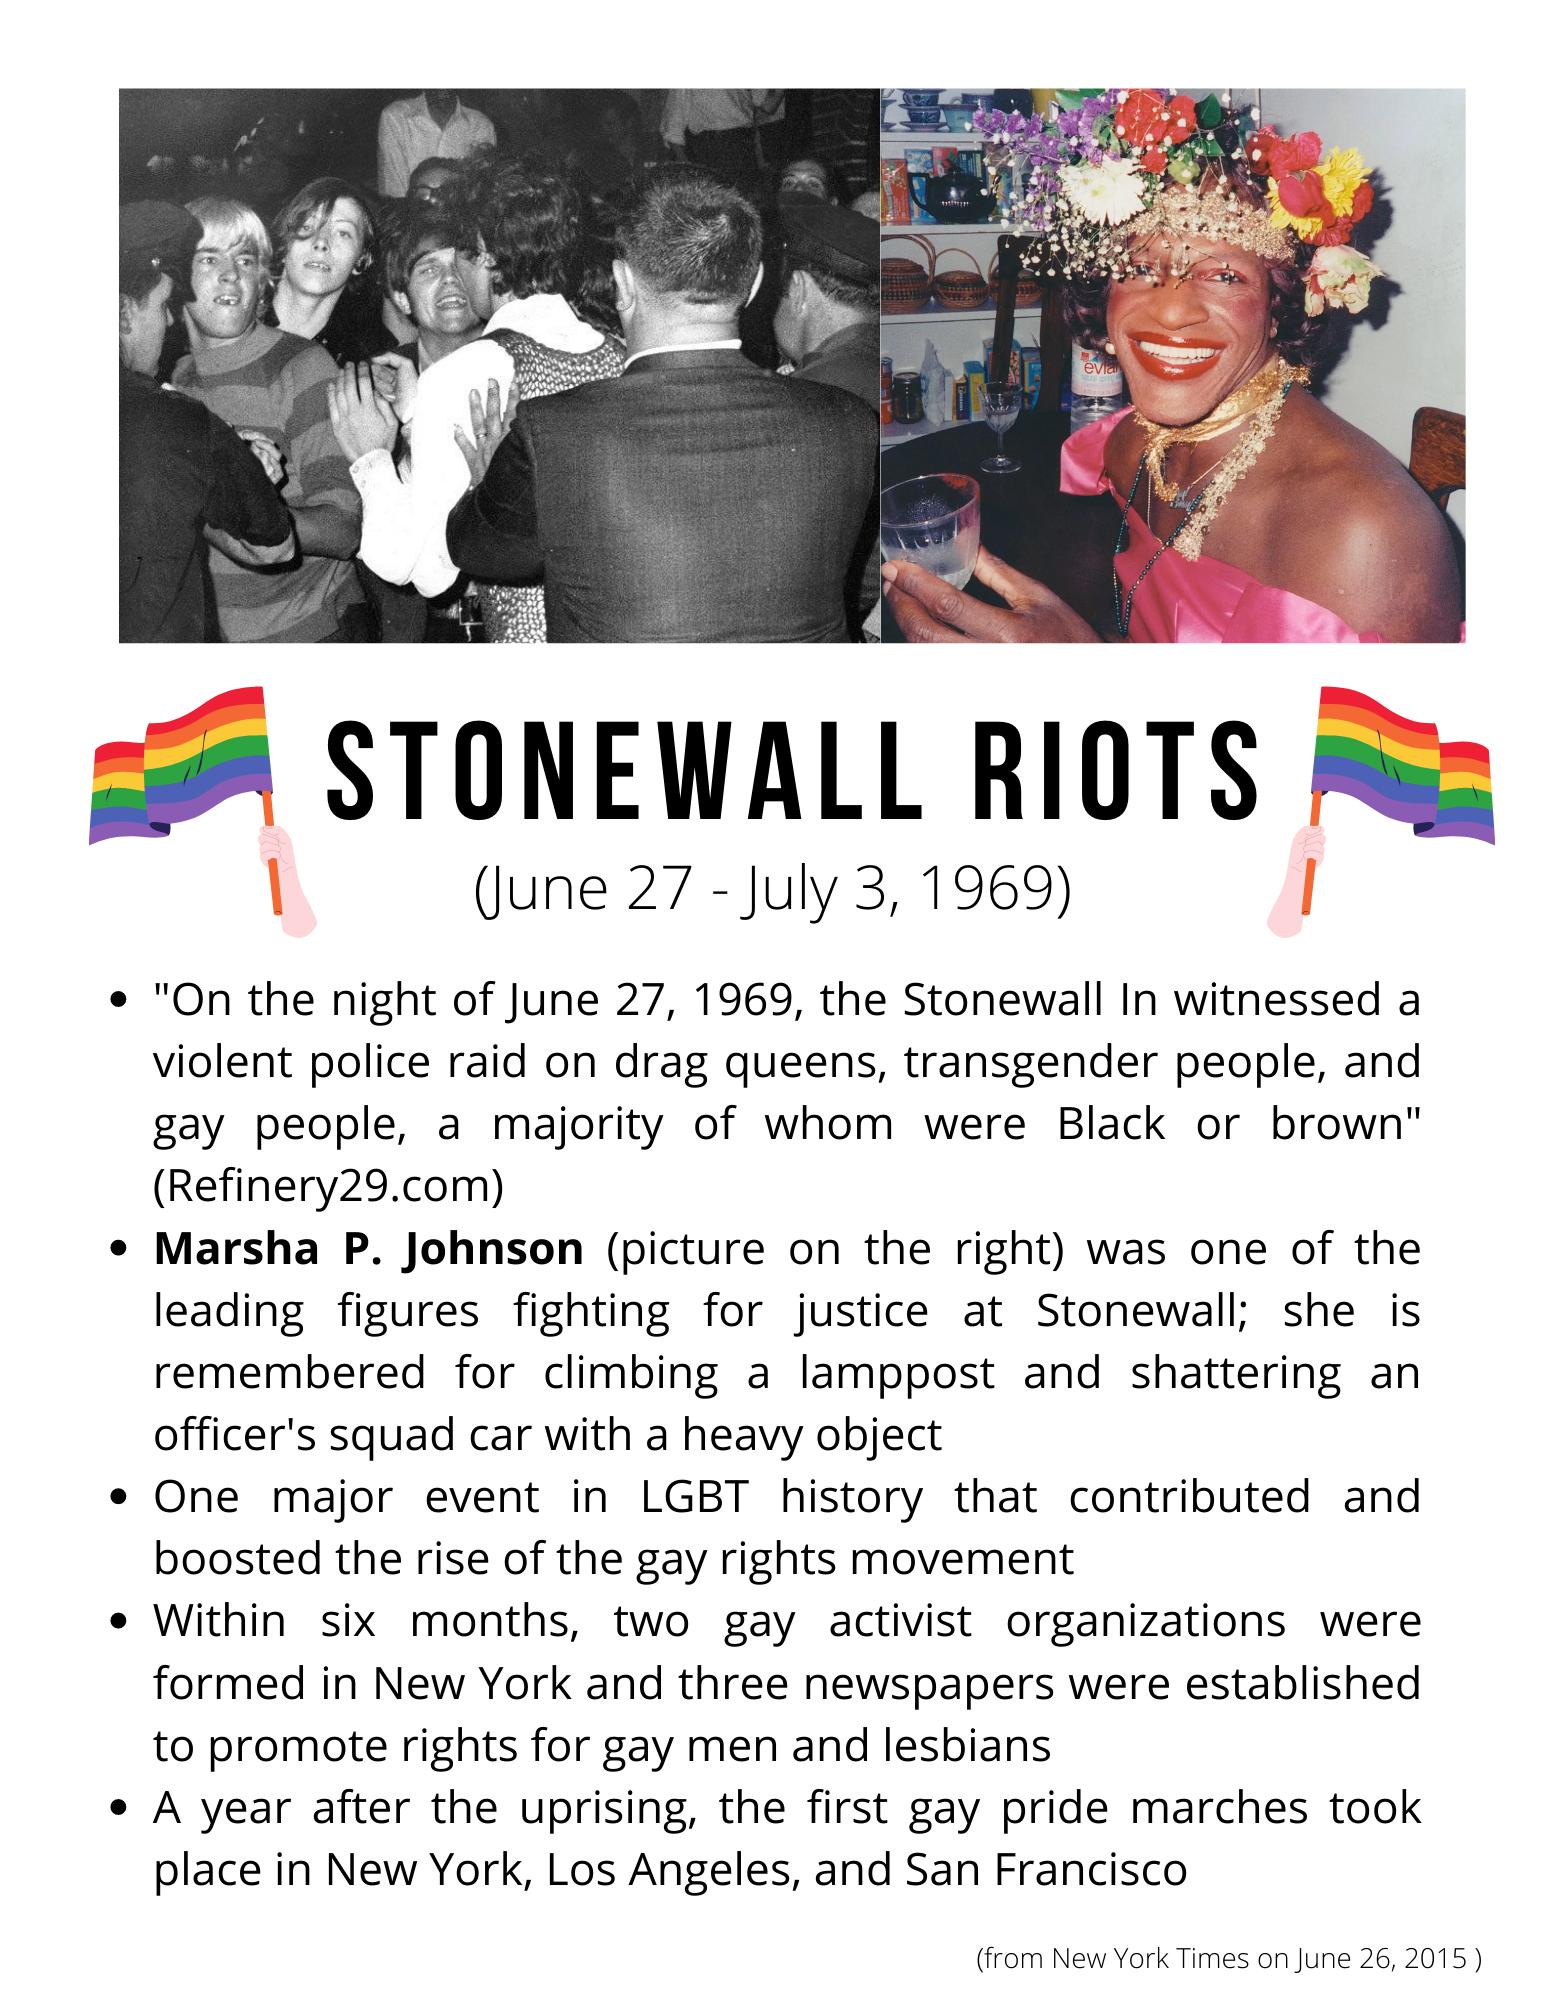 Stonewall riots history art